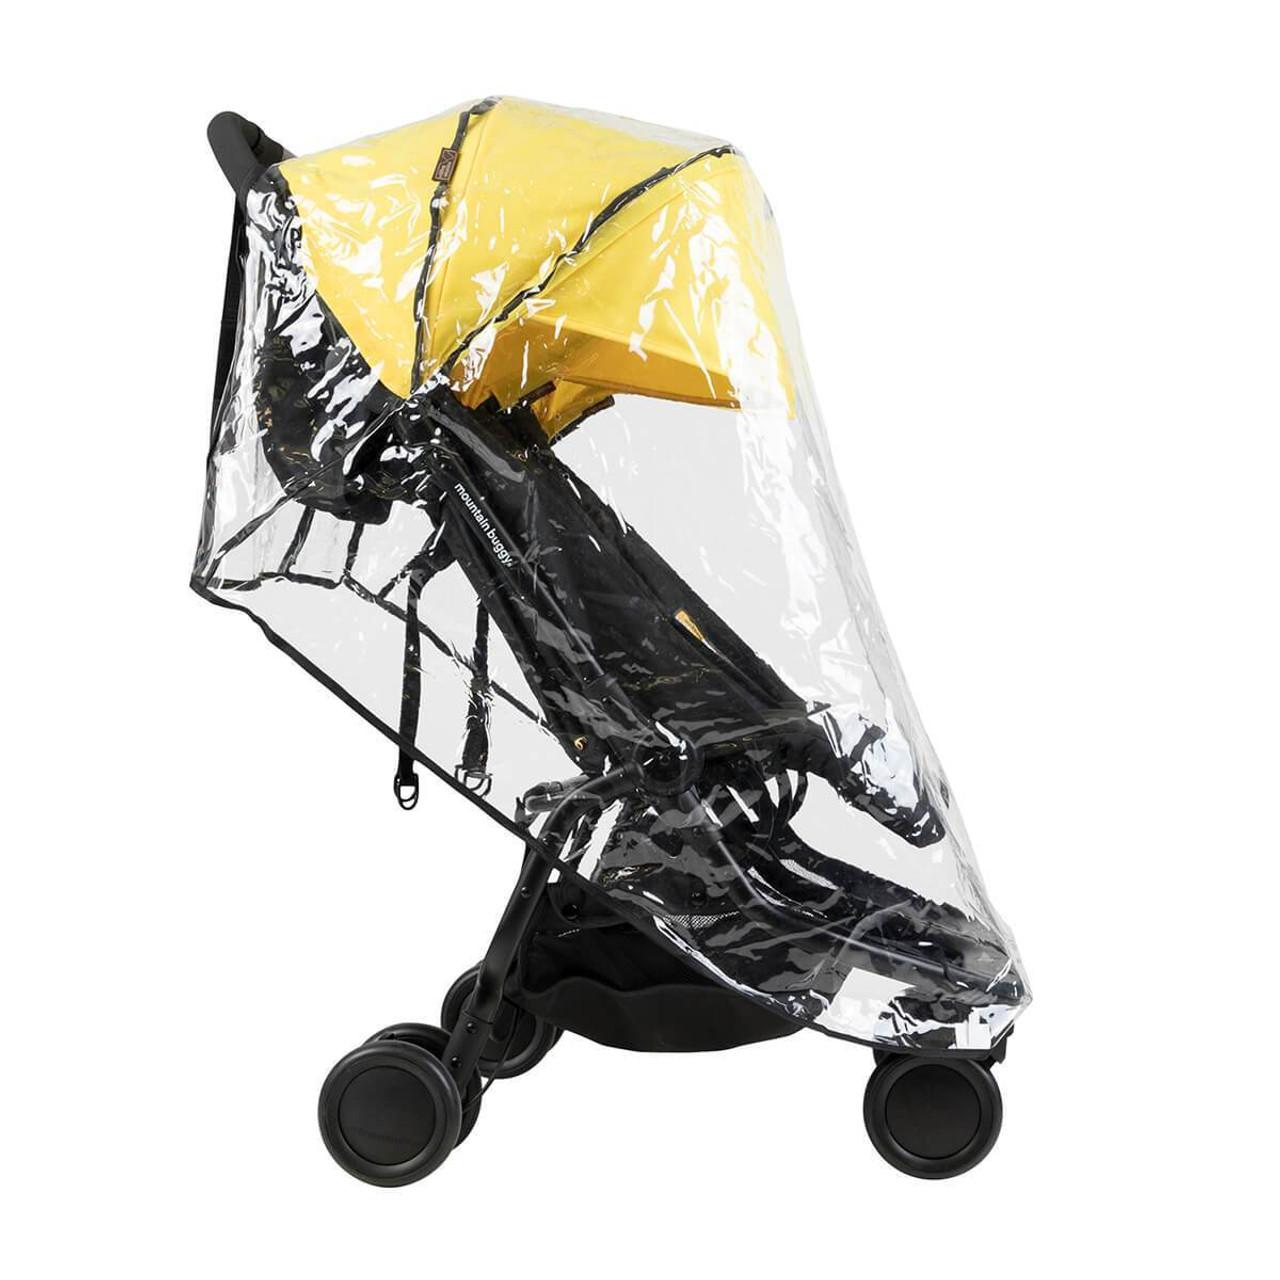 Mountain Buggy Nano Duo Storm Cover at Baby Barn Discounts